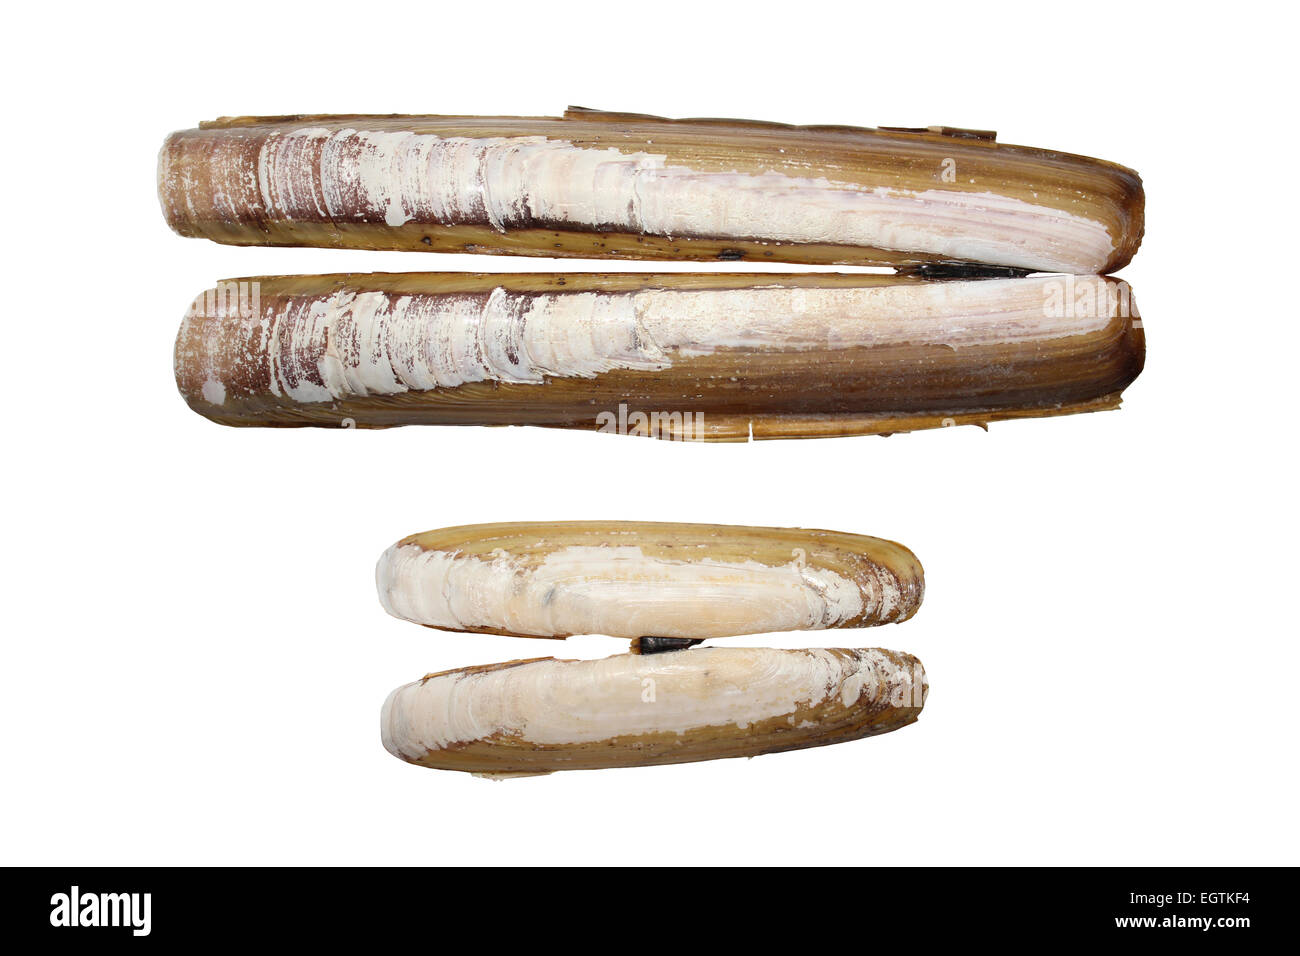 Comparison between Razorshell Ensis arcuatus (above) and Bean Razor Shells Pharus legumen (below) - Stock Image